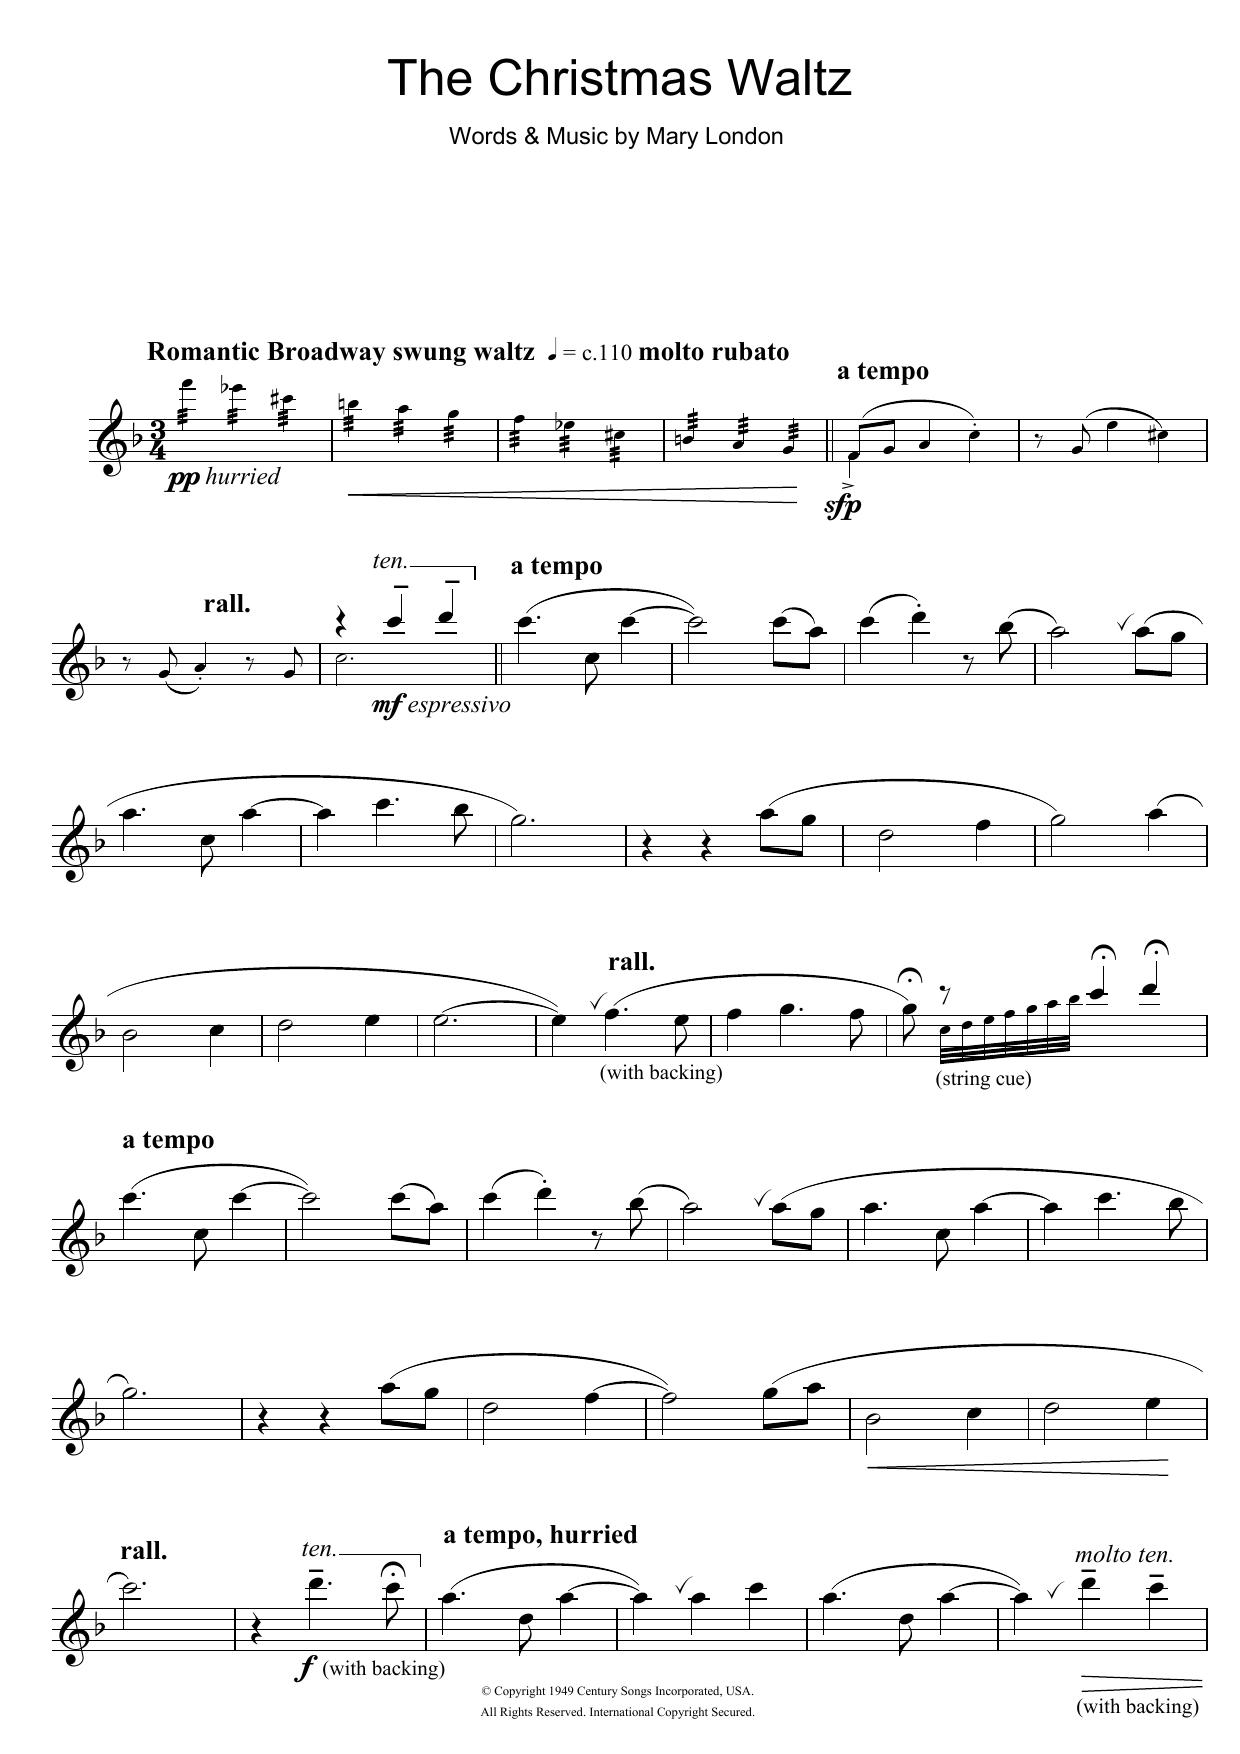 Christmas Waltz Chords.Mary London The Christmas Waltz At Stanton S Sheet Music